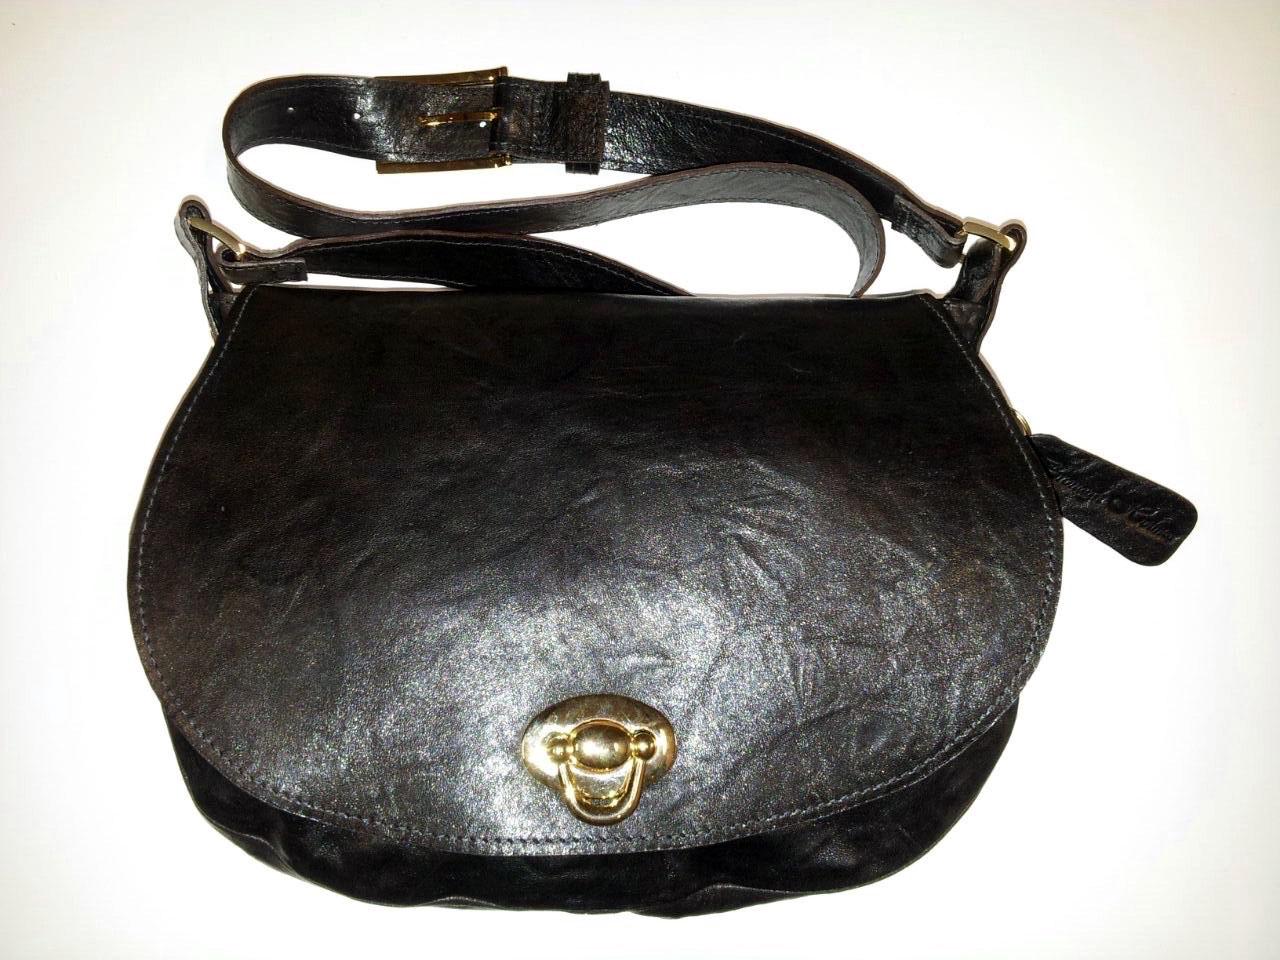 Bronagh Holmes Luxury - Alana - Brown with Small Lock